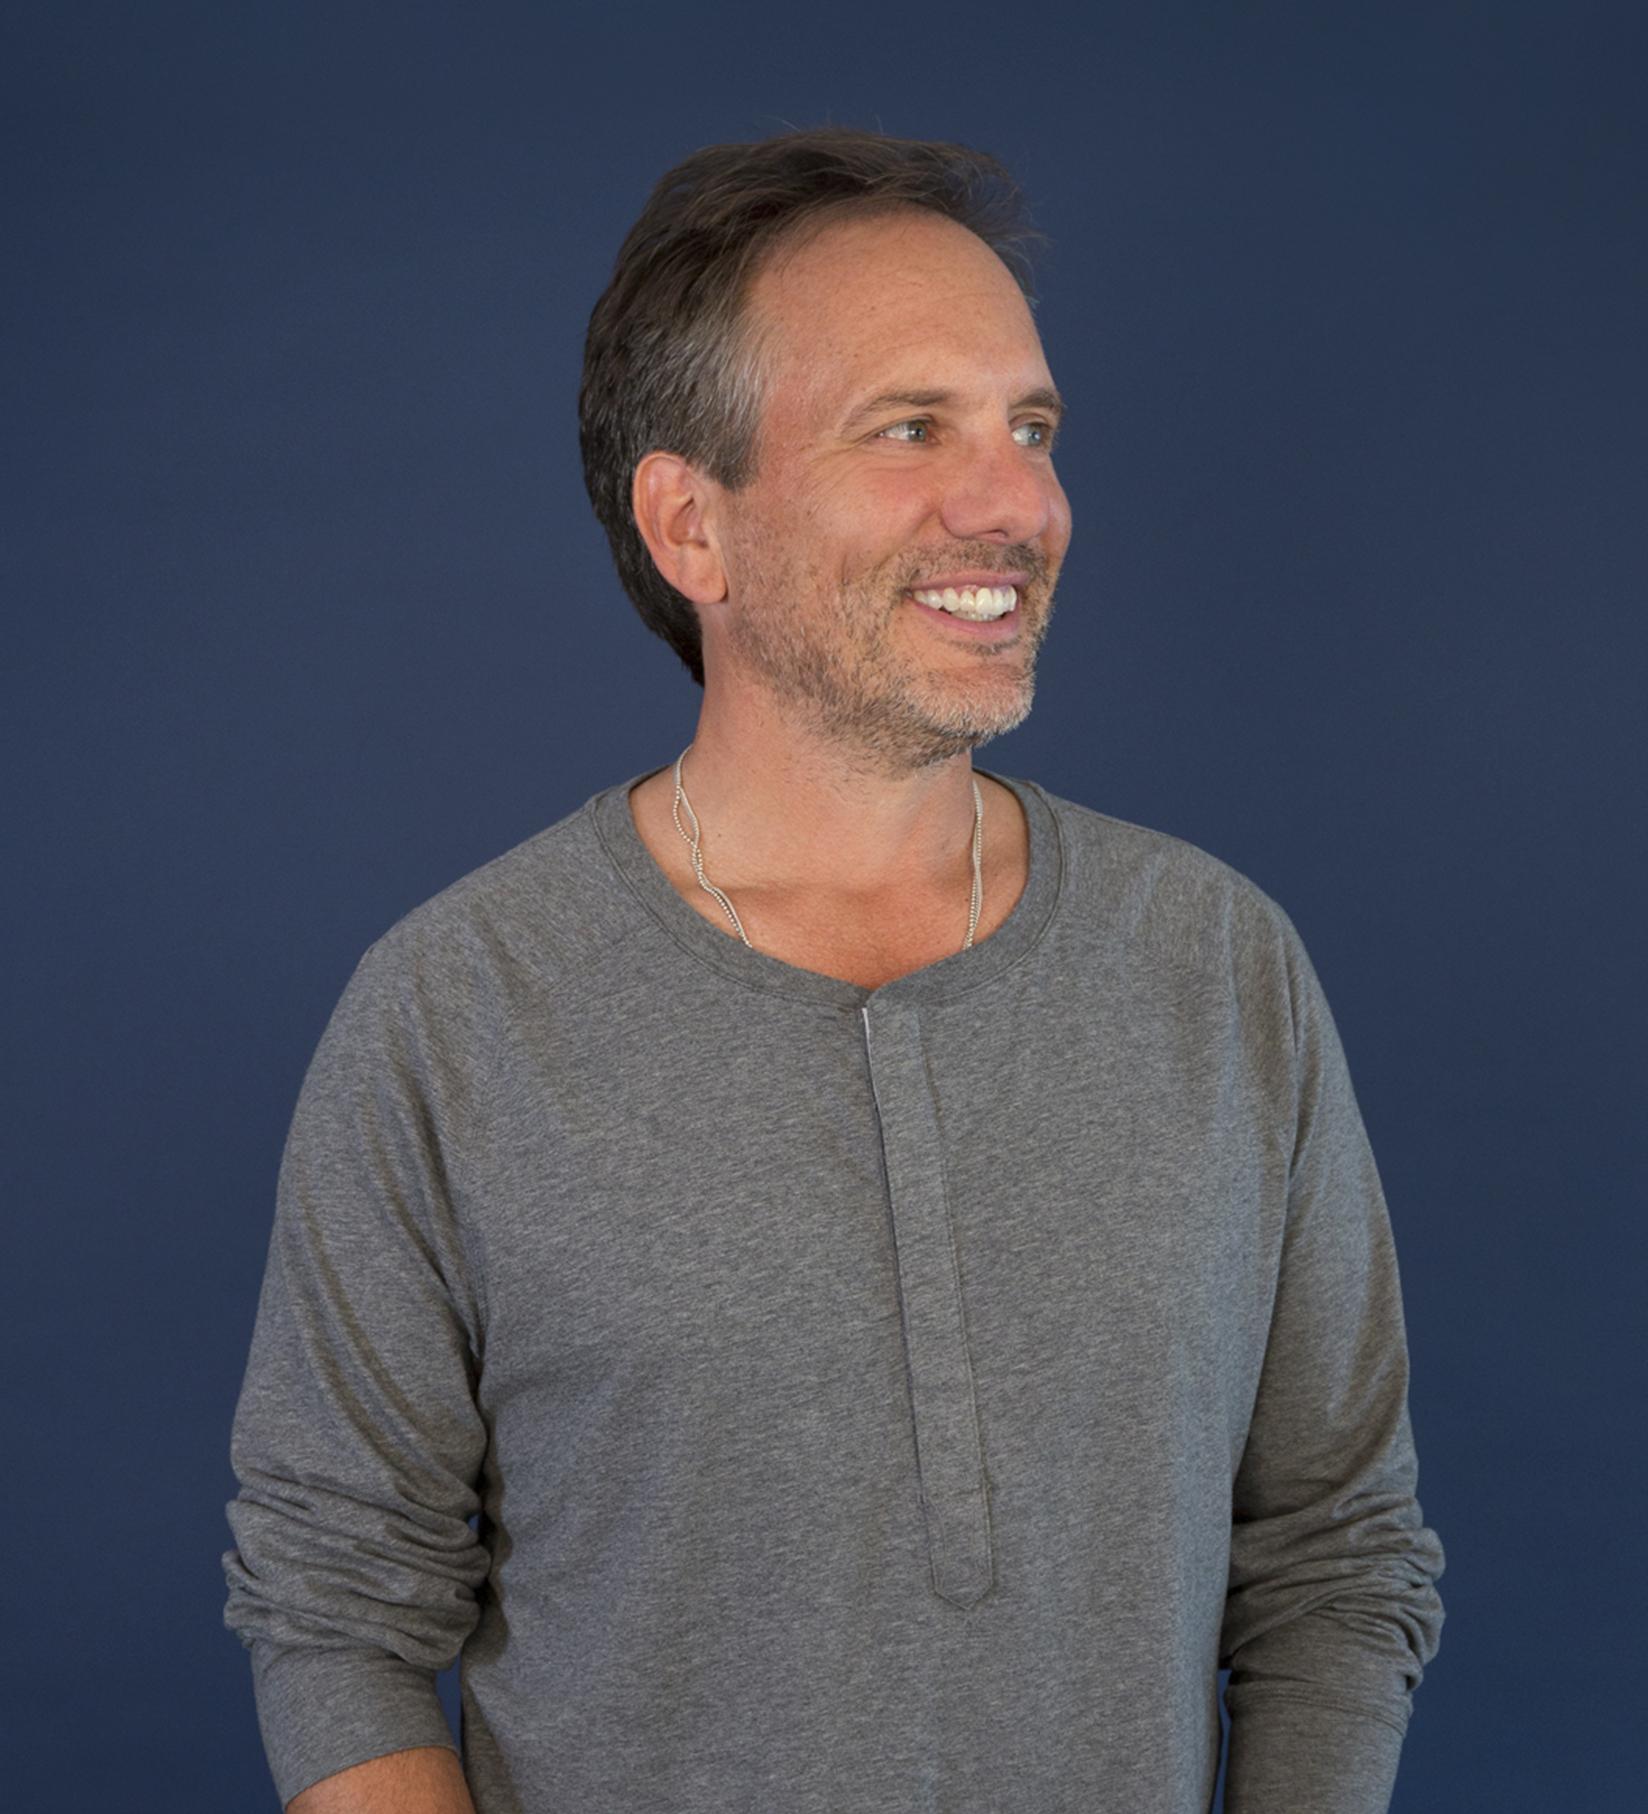 Nick Jelinek